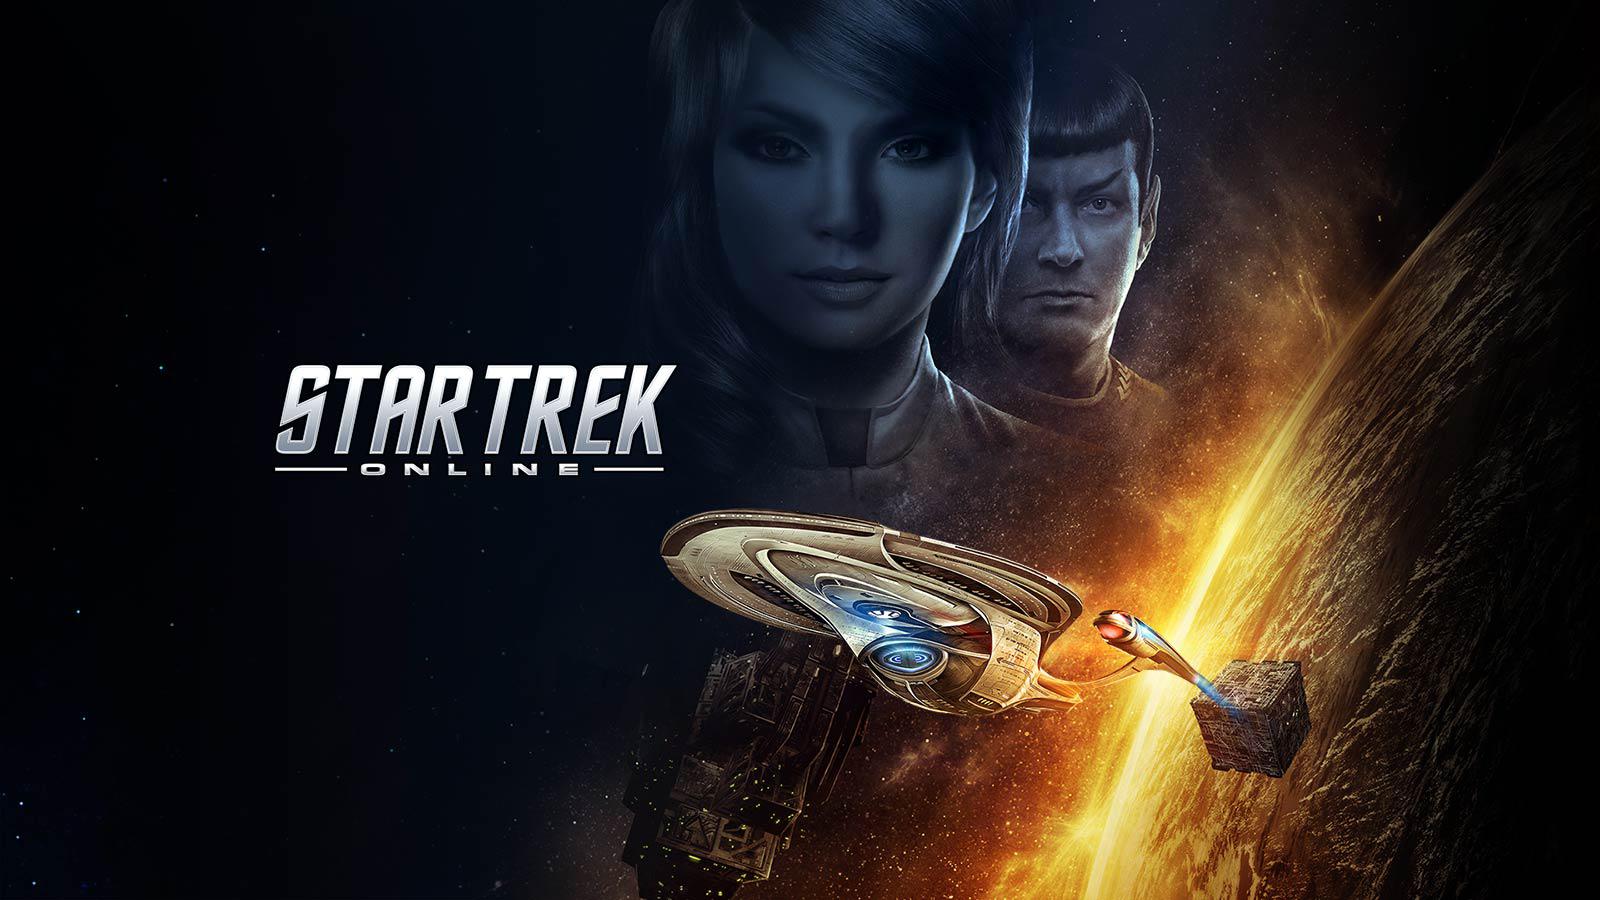 Star Trk